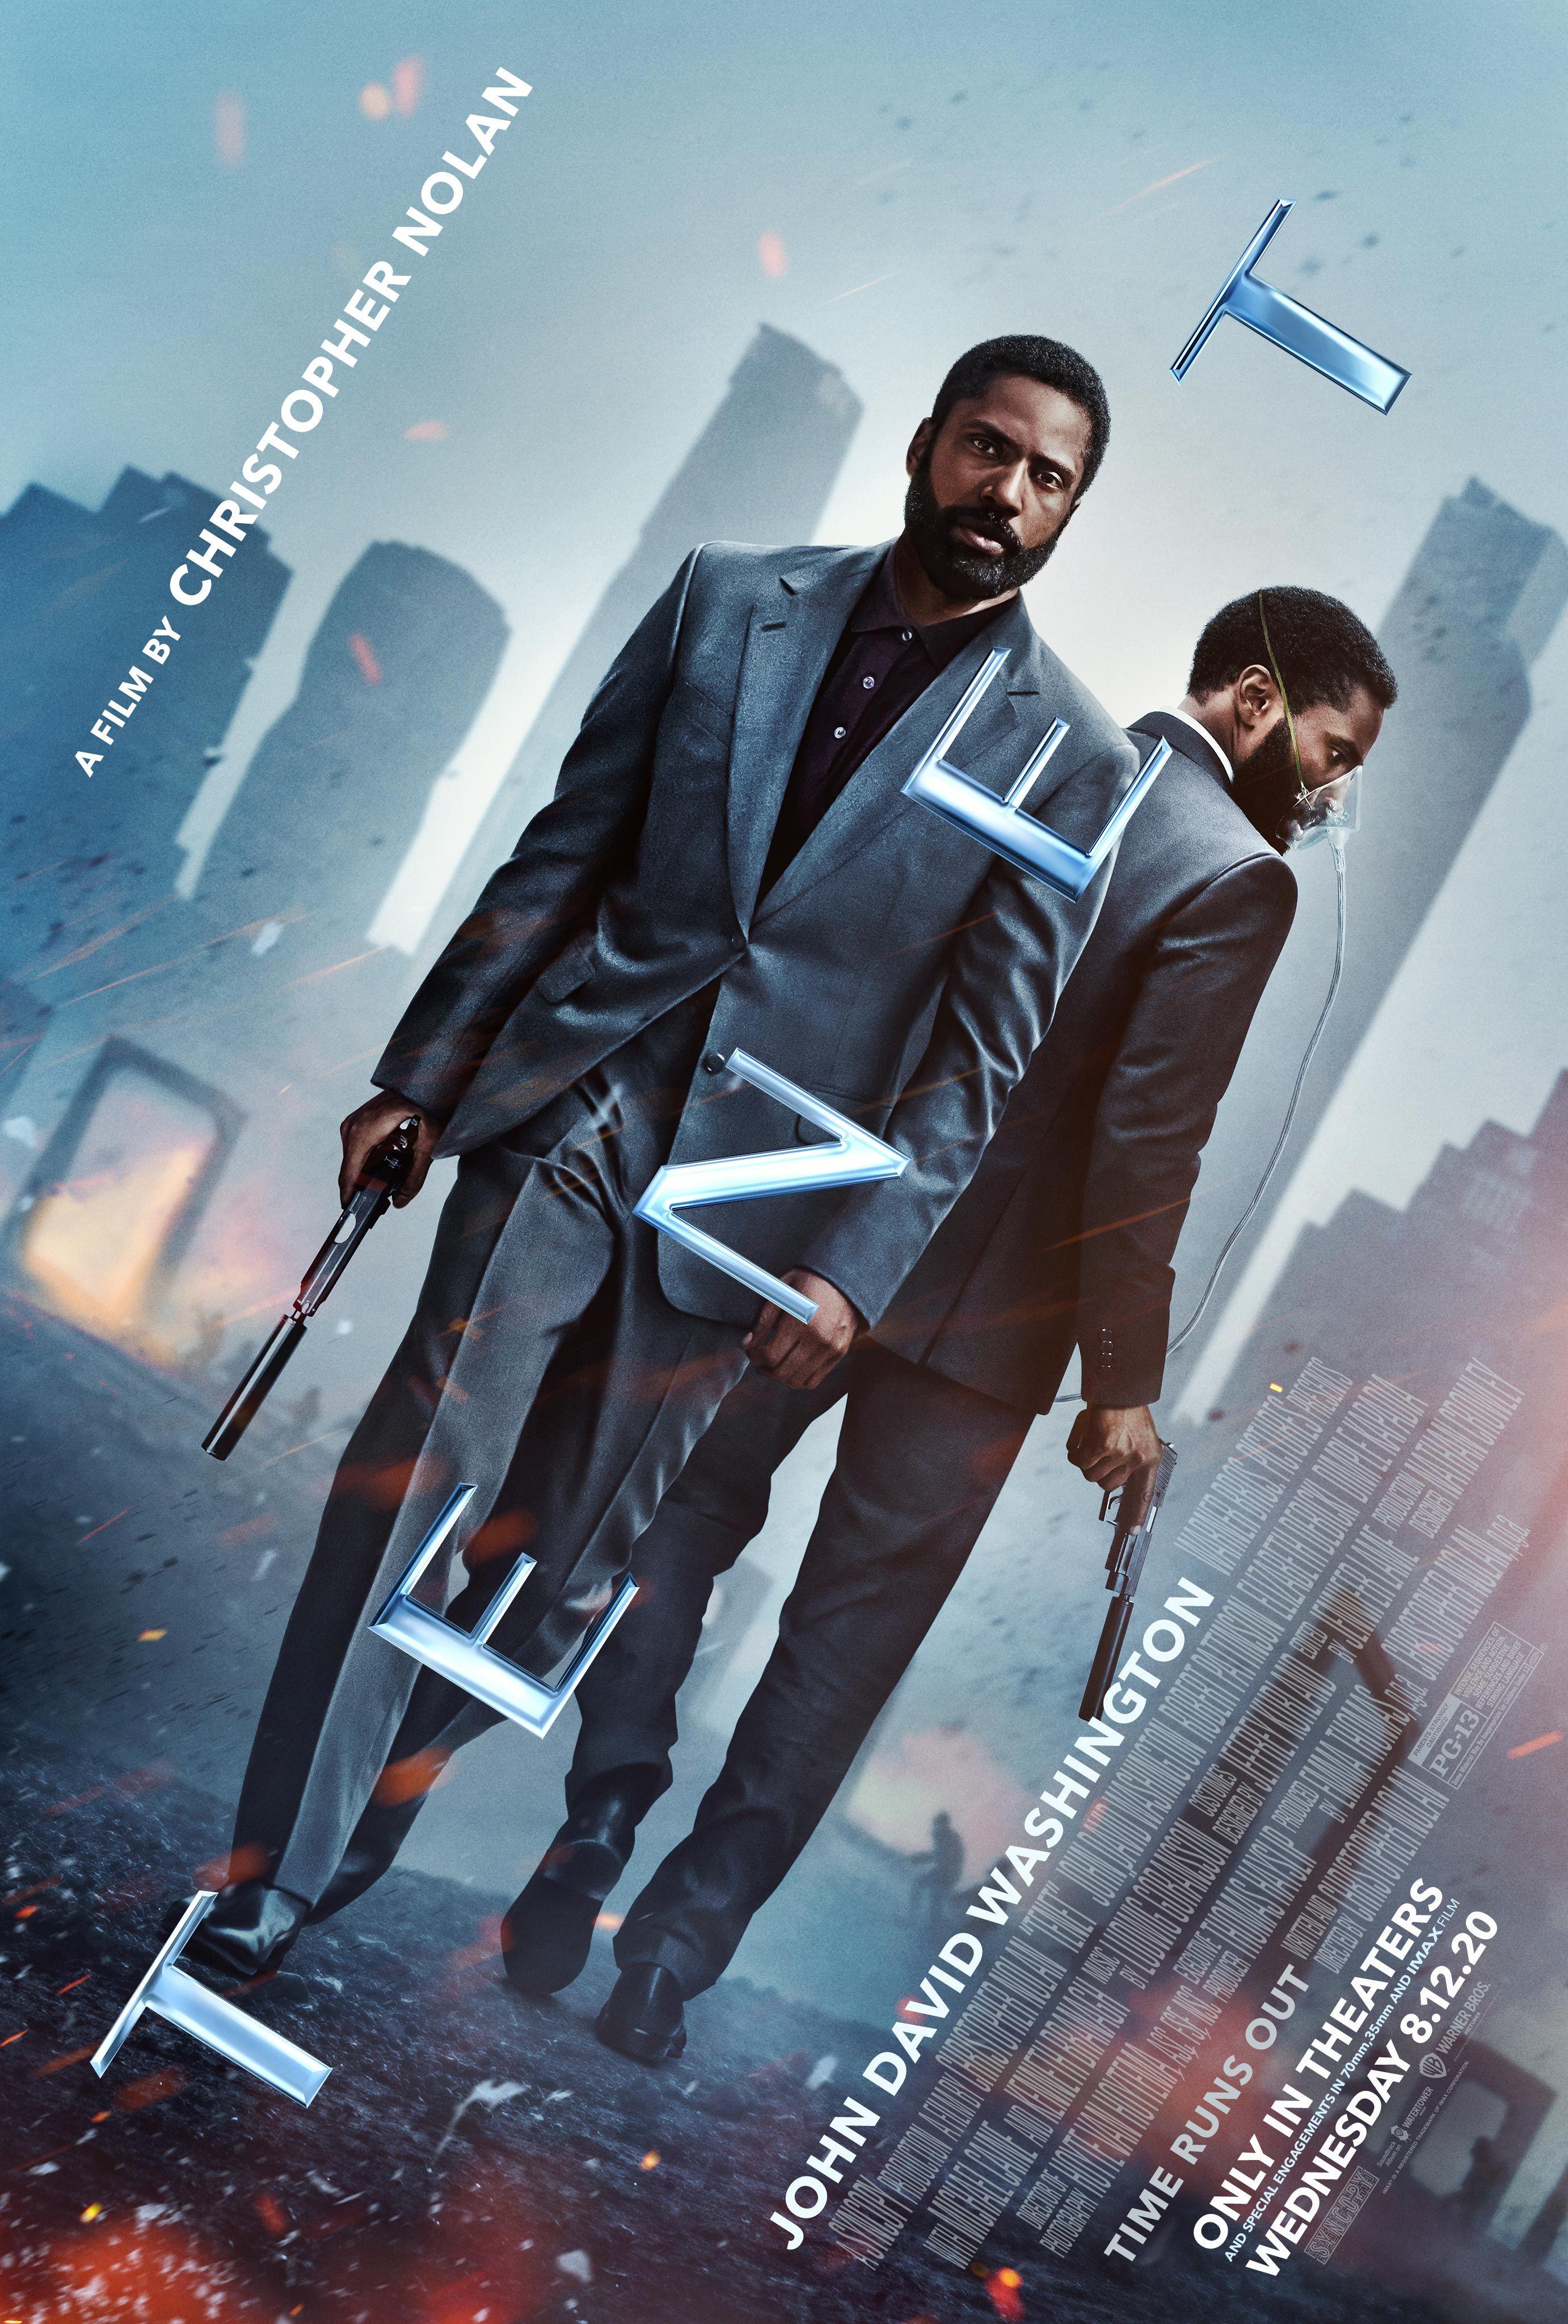 Sledujte Tenet 2020 Online Cz Sk Cely Film Zdarma Dabing Hd New Movies Christopher Nolan Spy Film